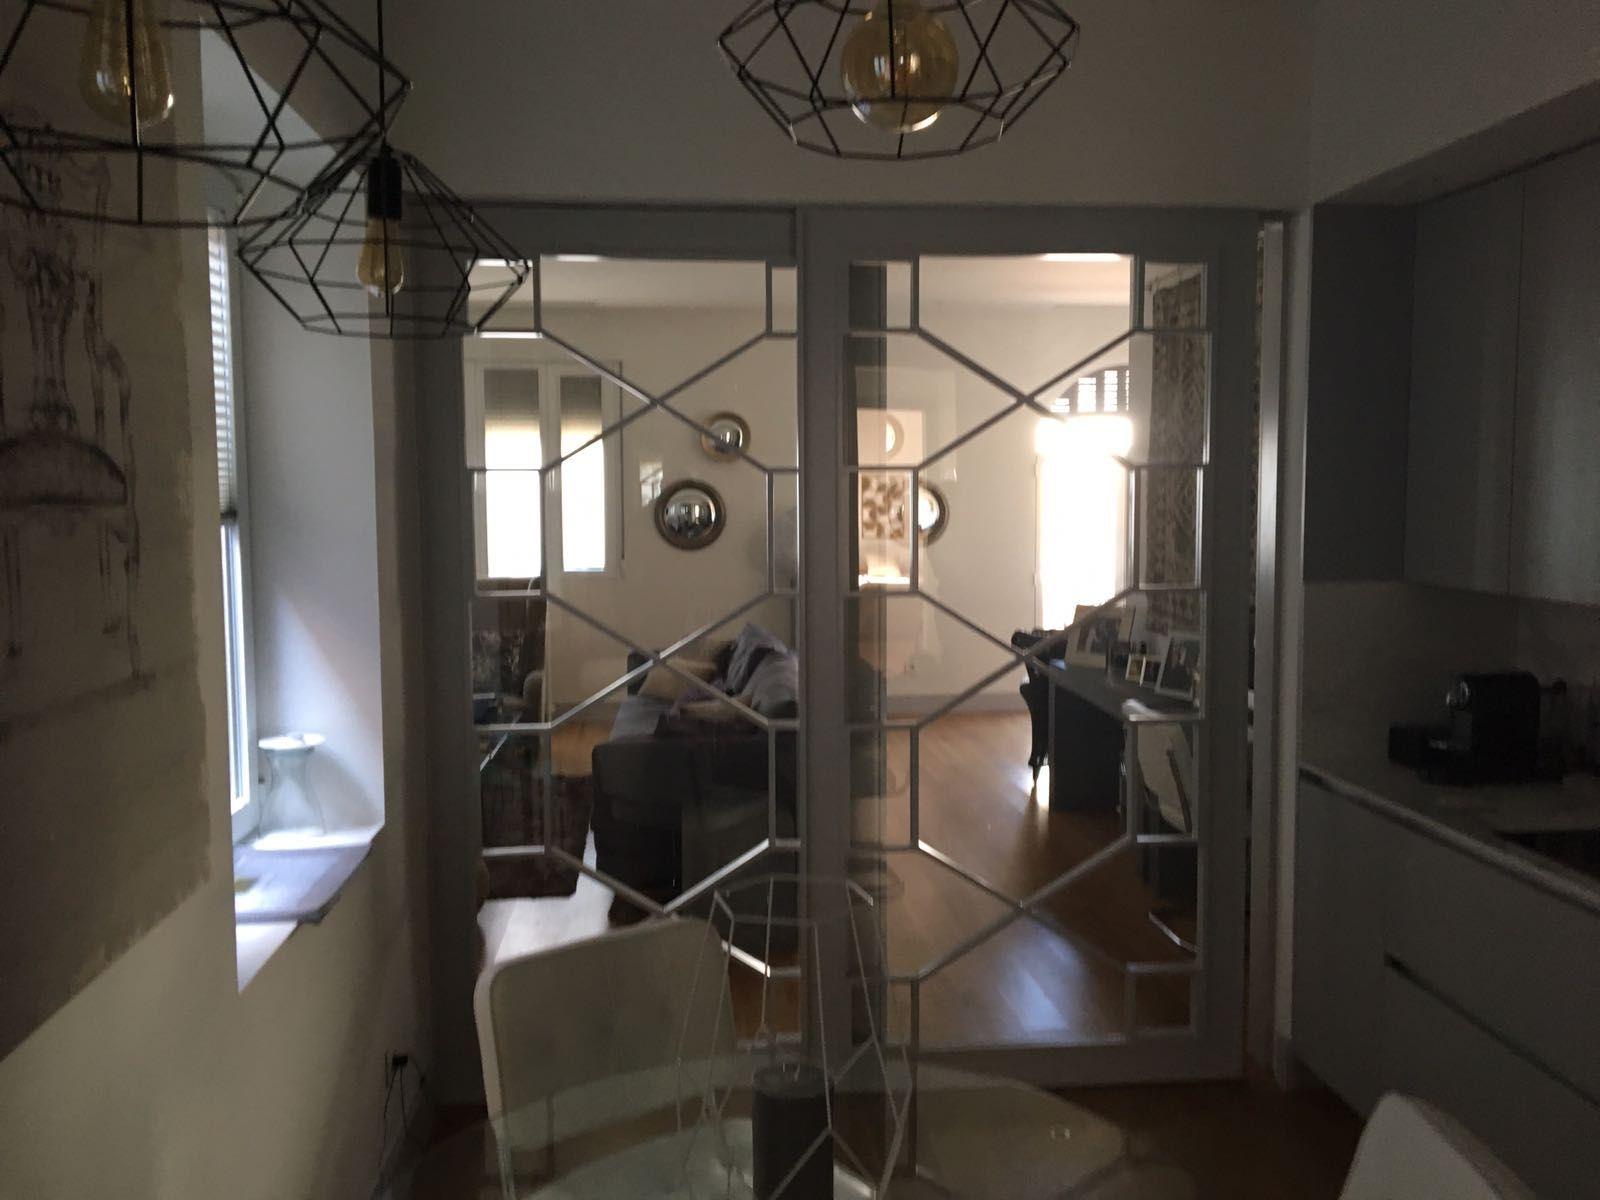 Puertas: Catálogo de muebles de Gompar